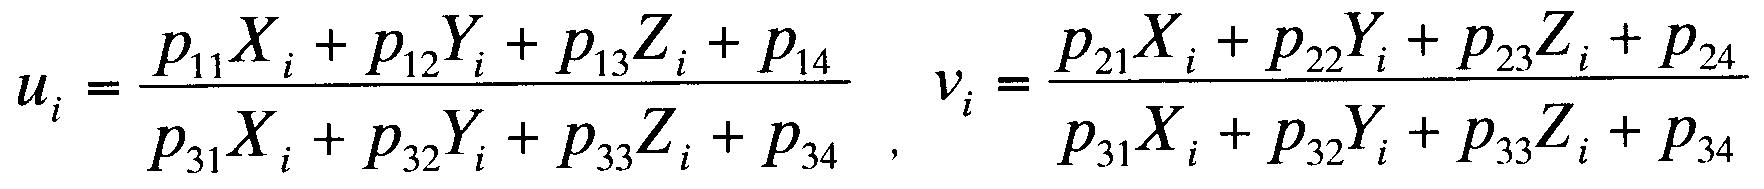 Figure 112004001539118-pat00013